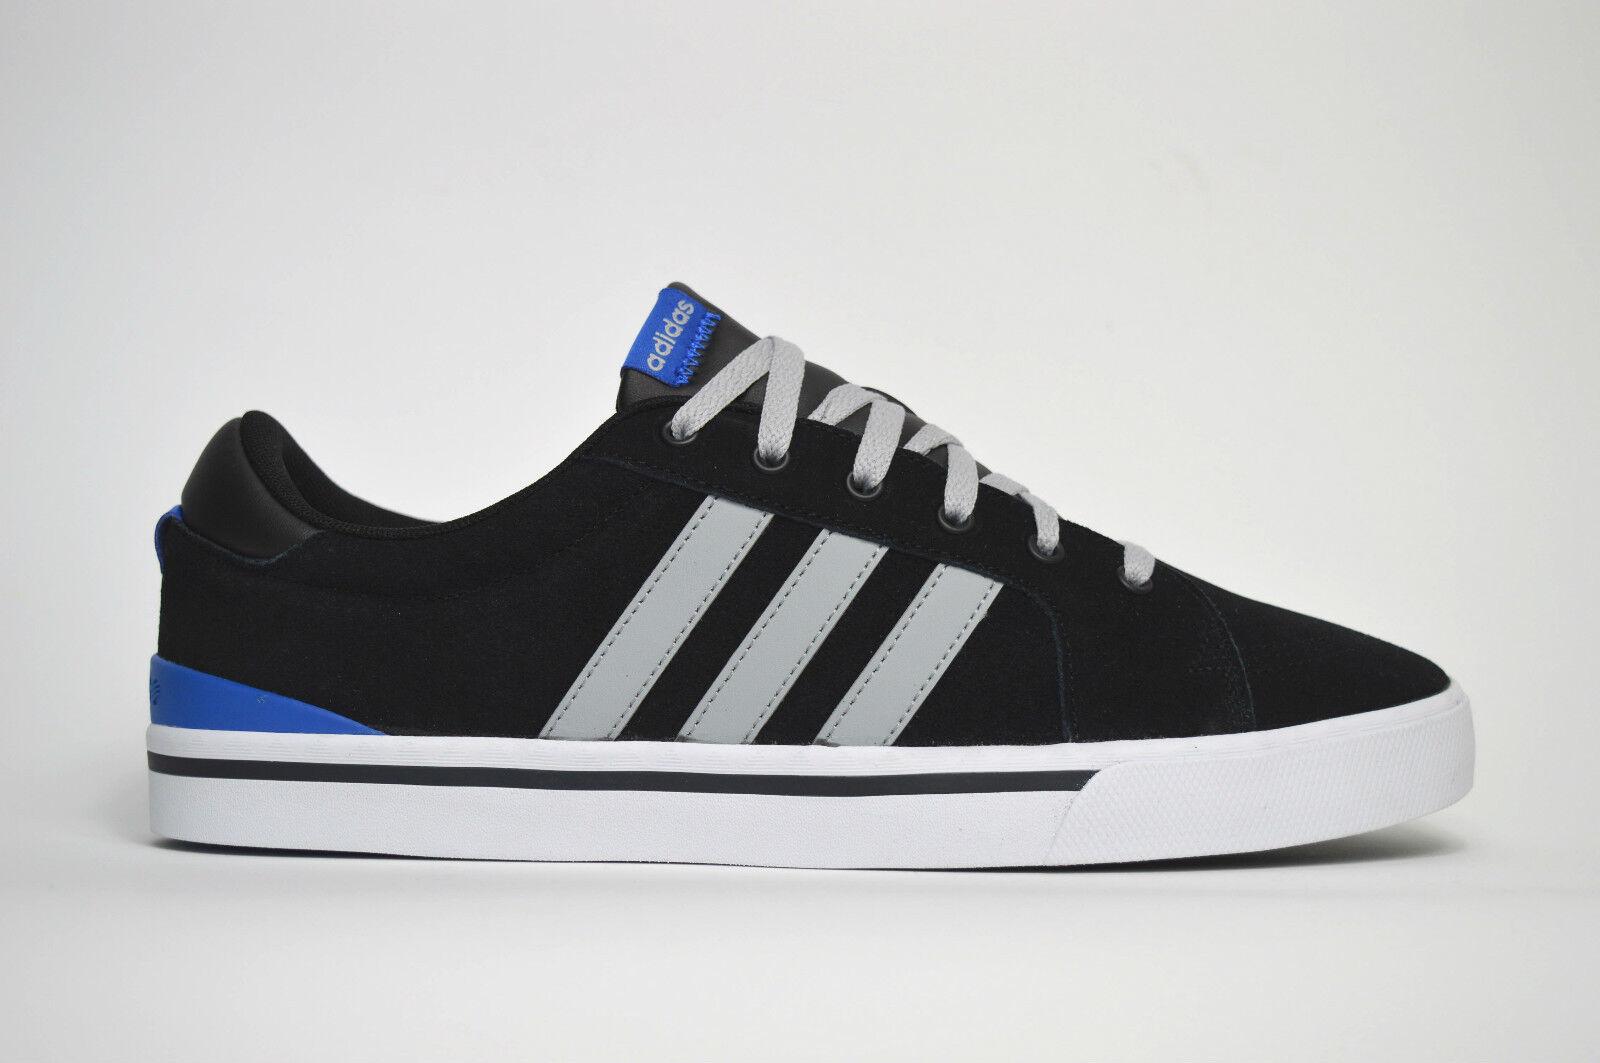 Adidas Park ST NEU Sneaker schwarz schwarz skate sb atmos patta max